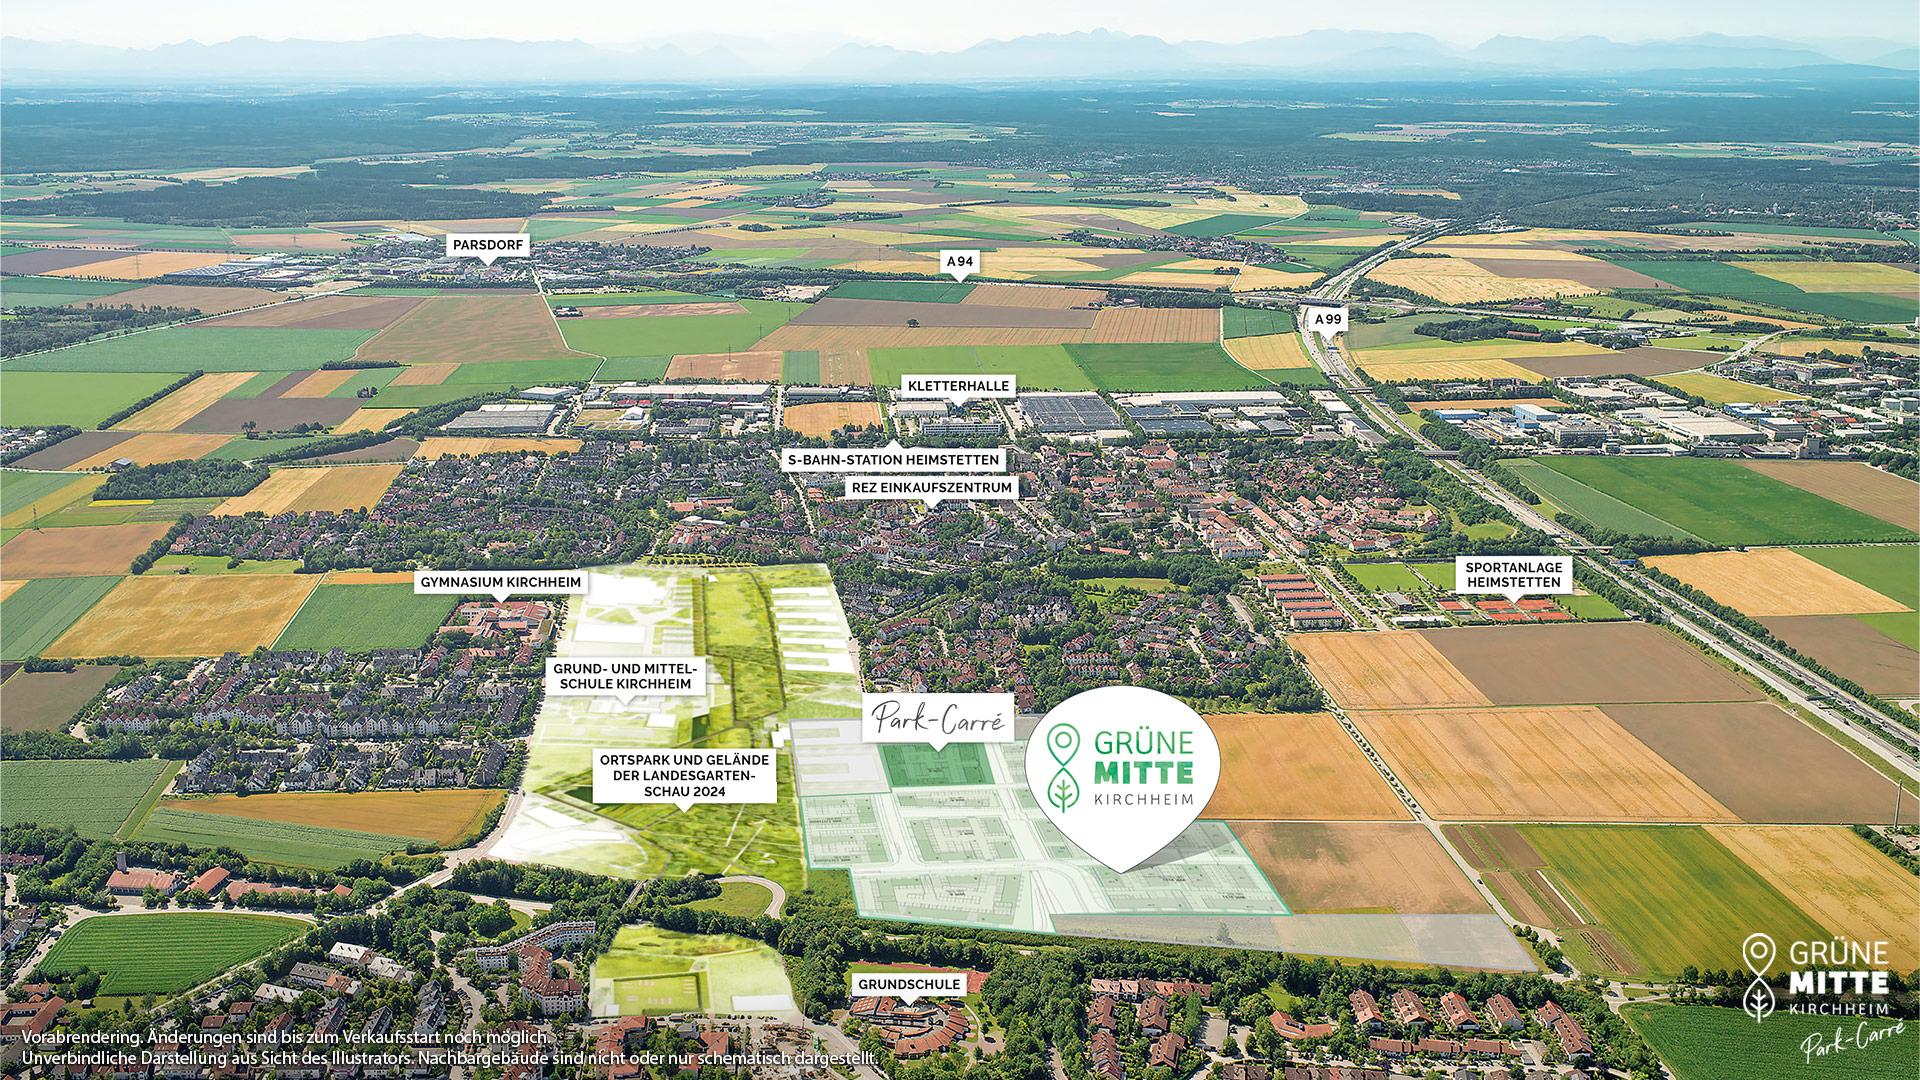 Immobilie Grüne Mitte Kirchheim - Park-Carré - Vorankündigung - Luftbild